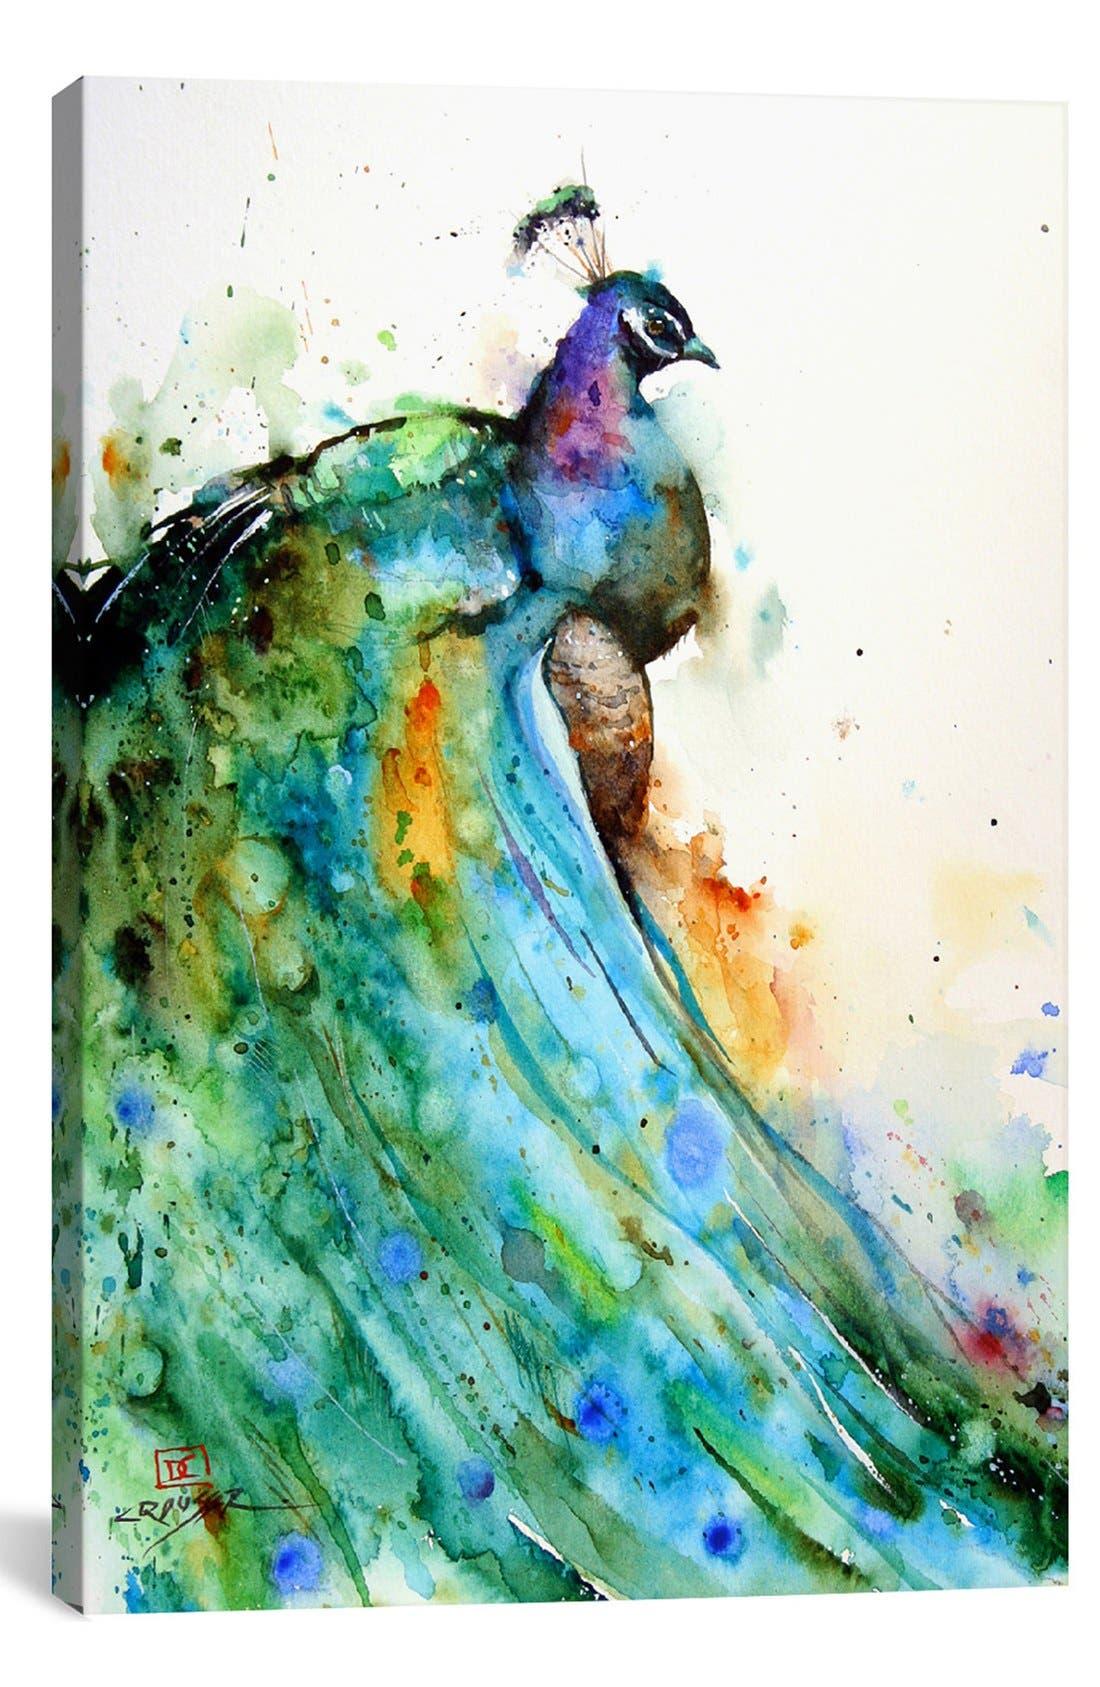 Alternate Image 1 Selected - iCanvas 'Peacock - Dean Crouser' Giclée Print Canvas Art